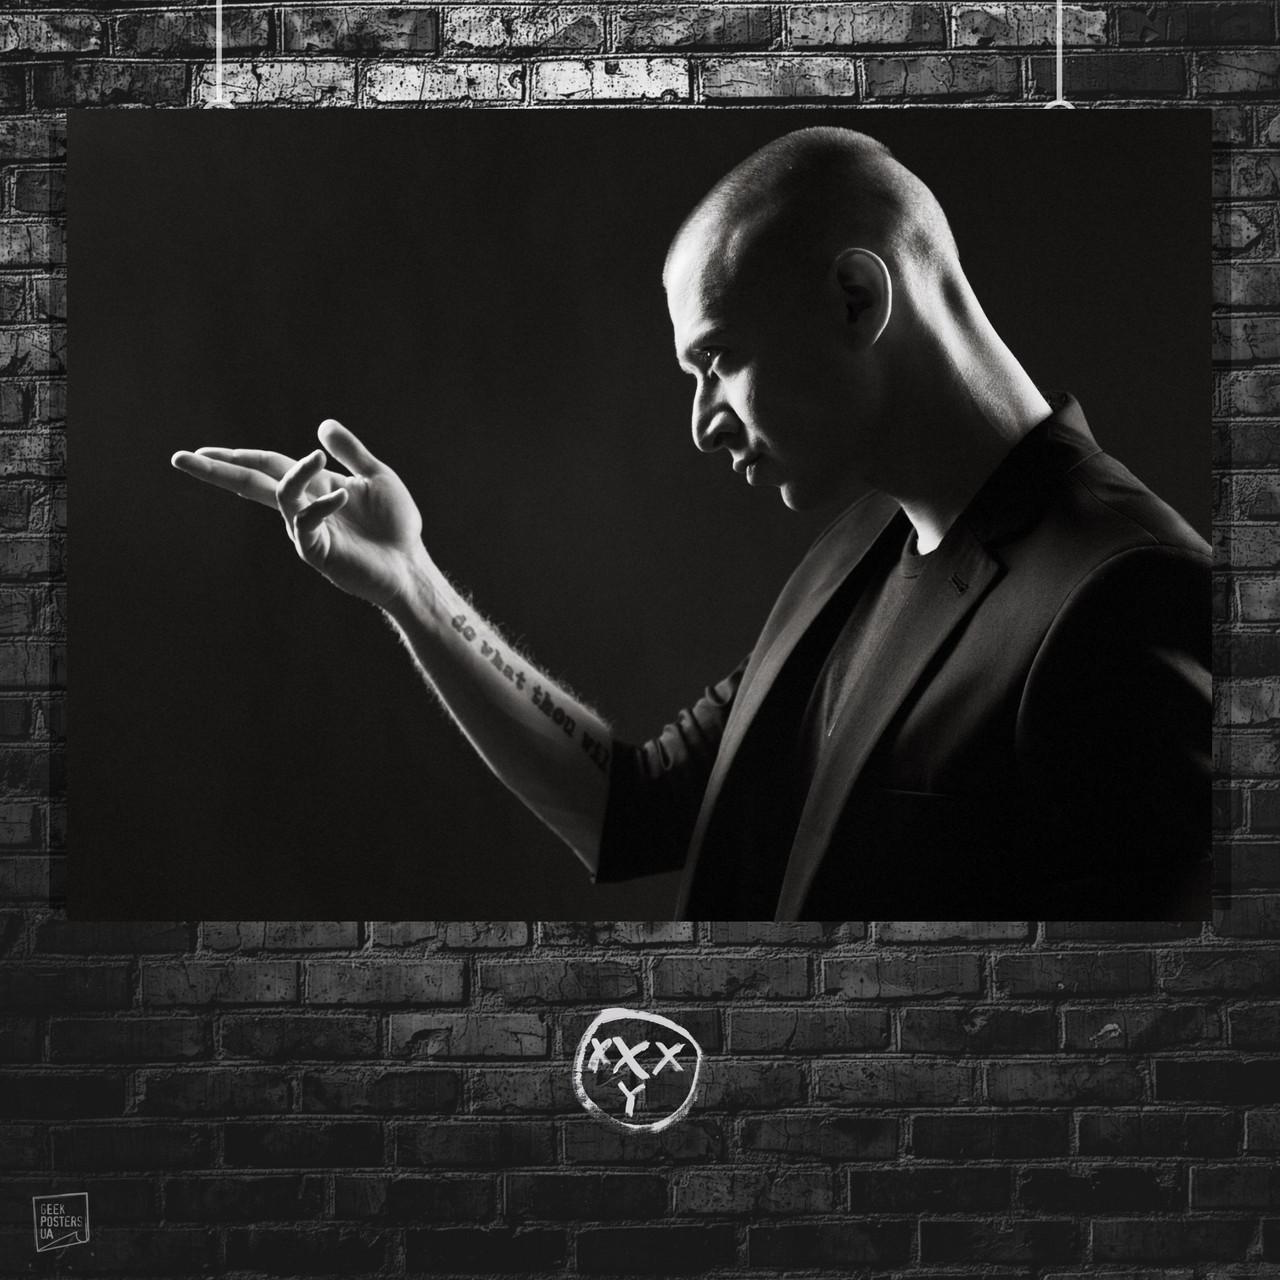 Постер Oxxxymiron, Оксимирон. Размер 60x42см (A2). Глянцевая бумага